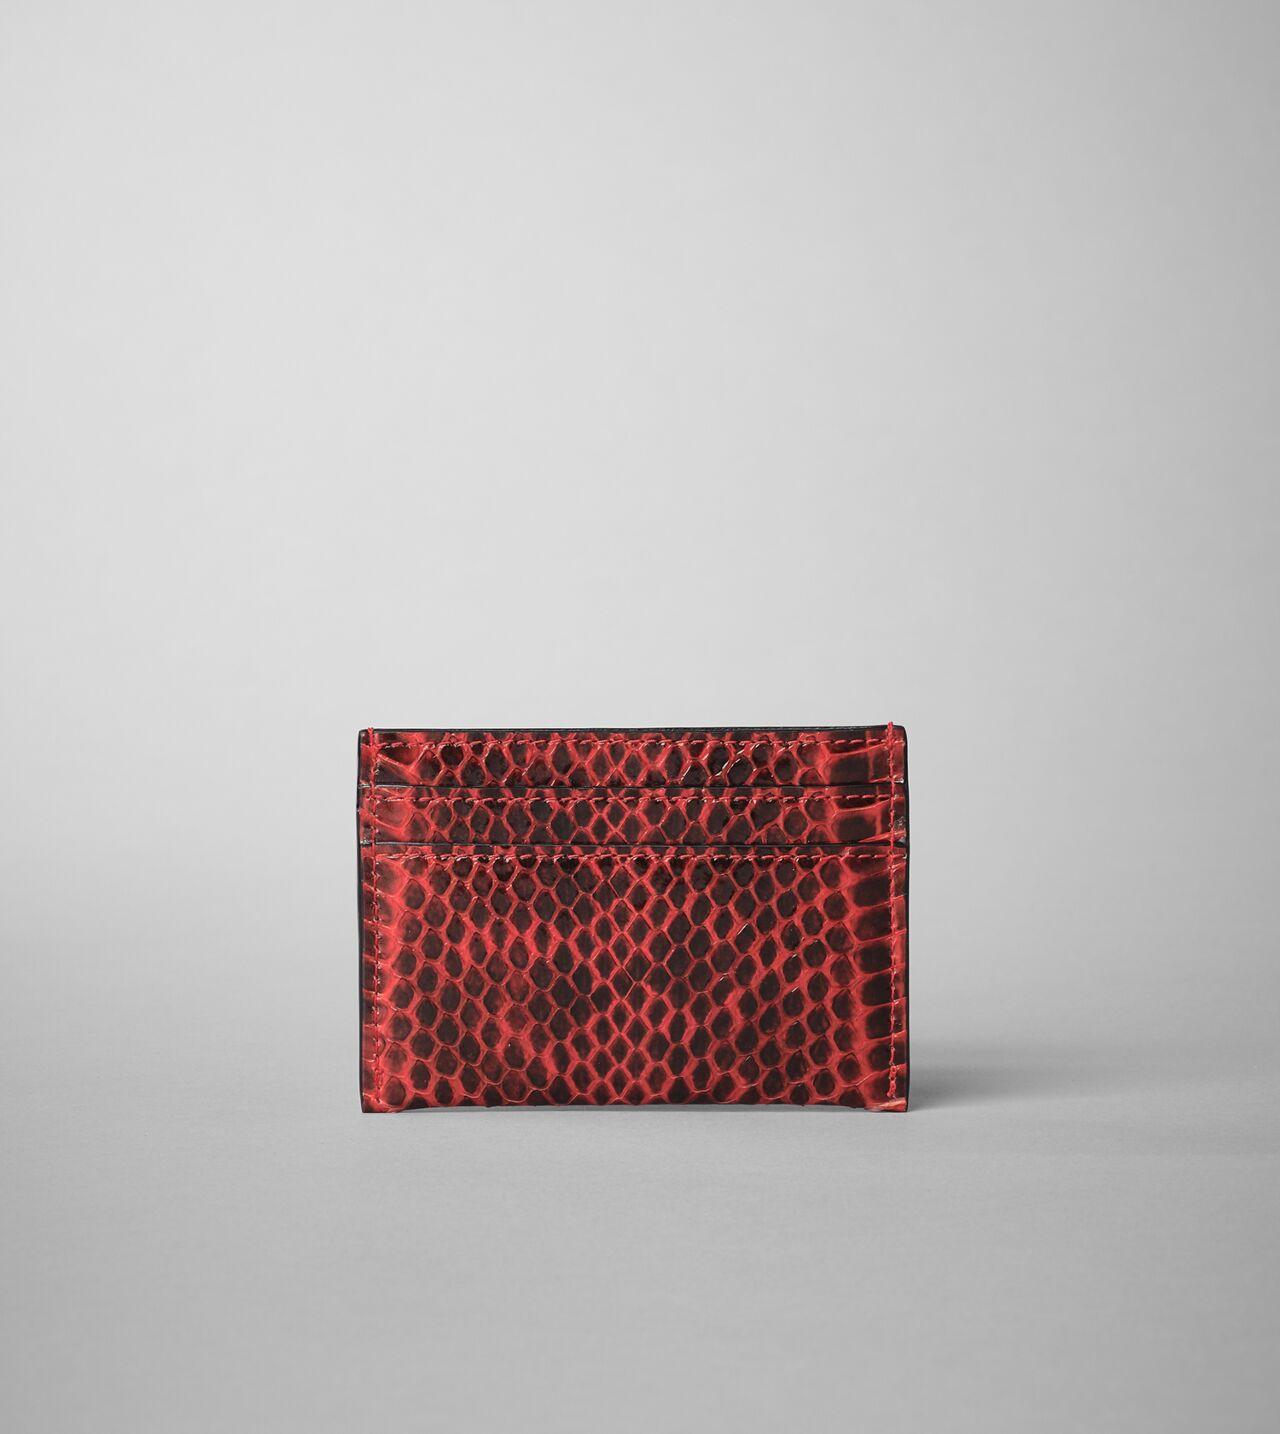 Picture of Byredo Credit card holder in Red elaphe snakeskin